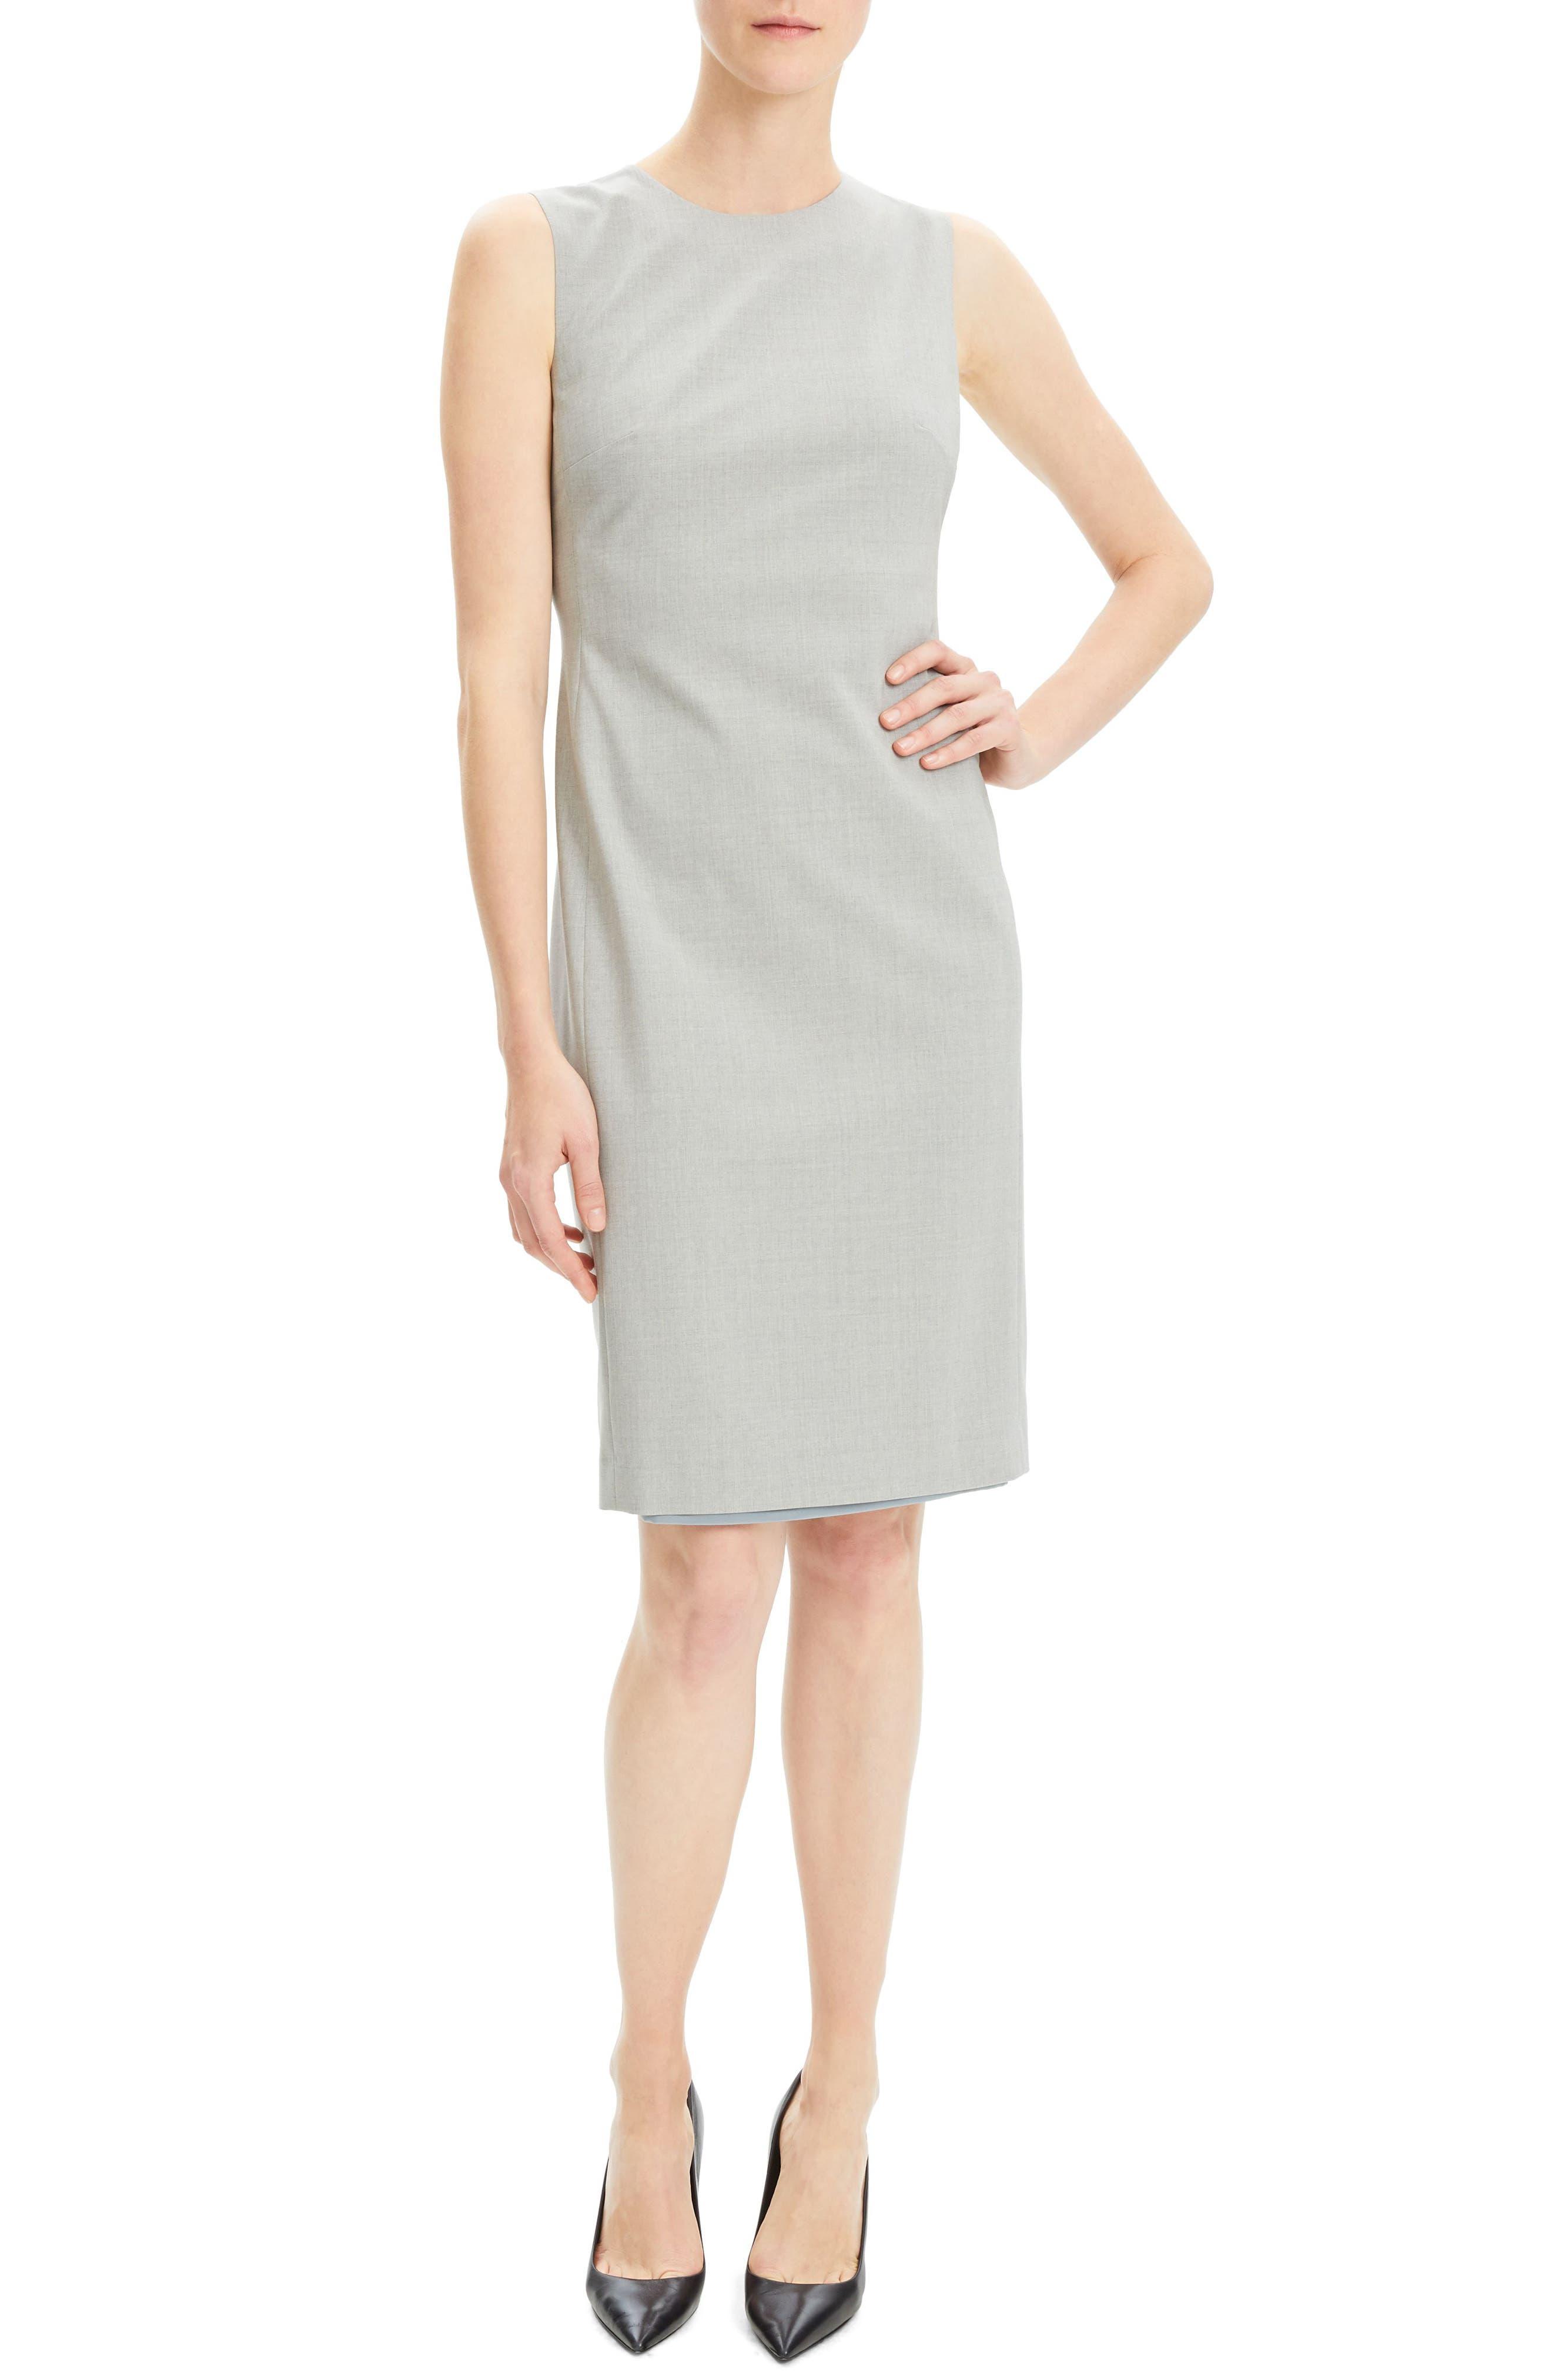 THEORY Eano Good Wool Sheath Dress, Main, color, 050